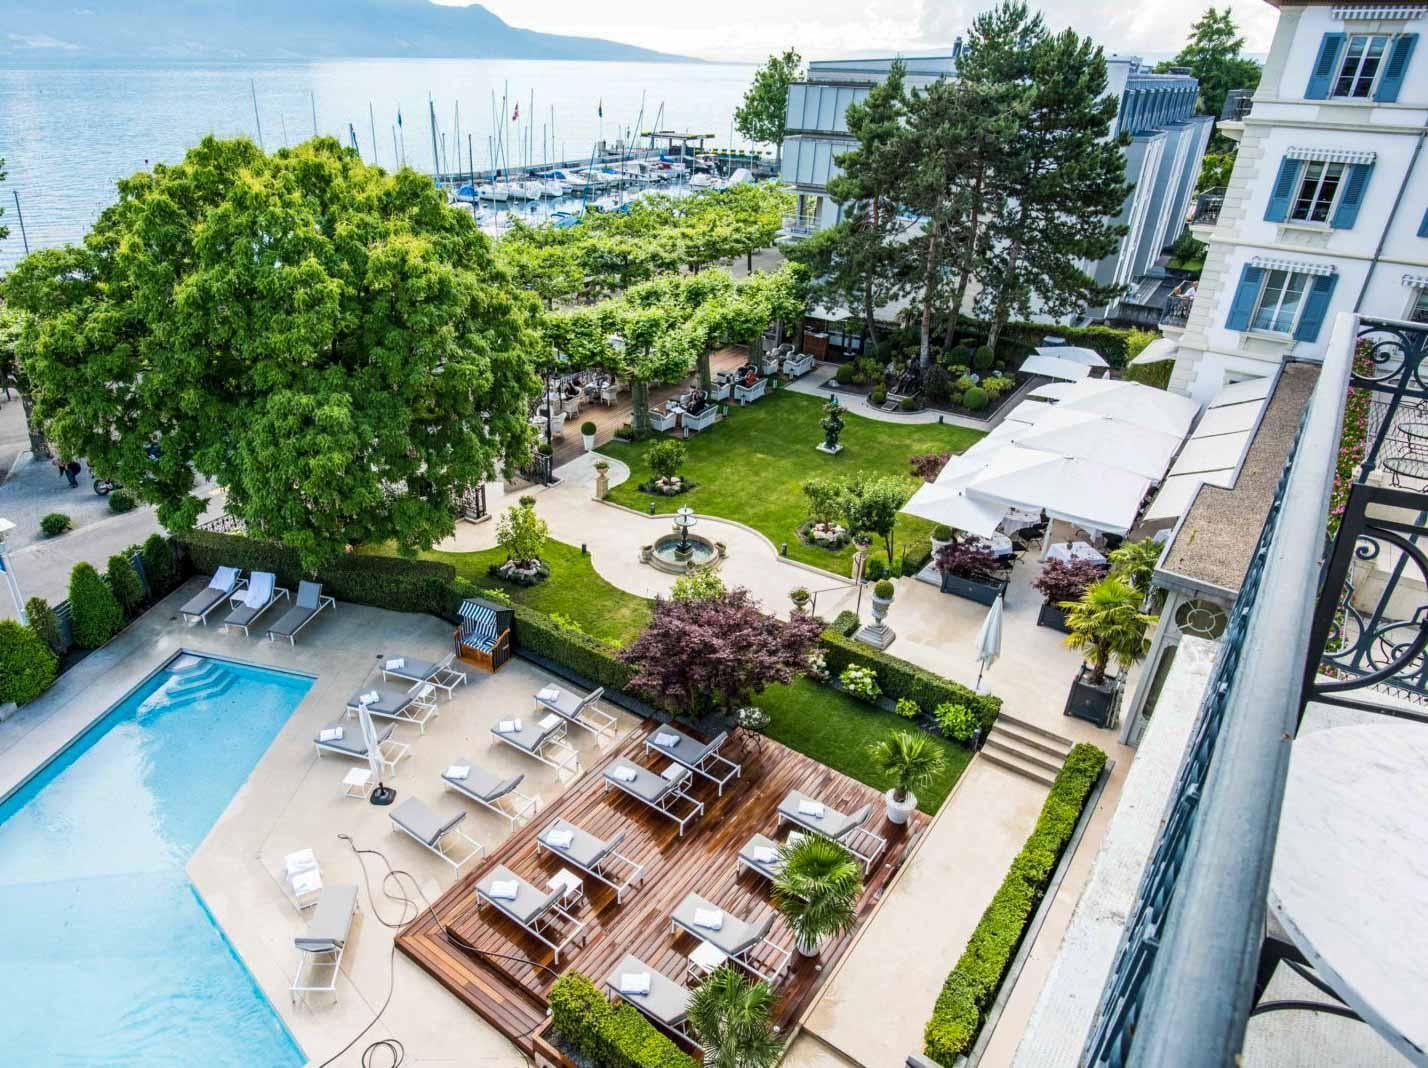 La piscine du Grand Hotel du Lac © Grand Hotel du Lac